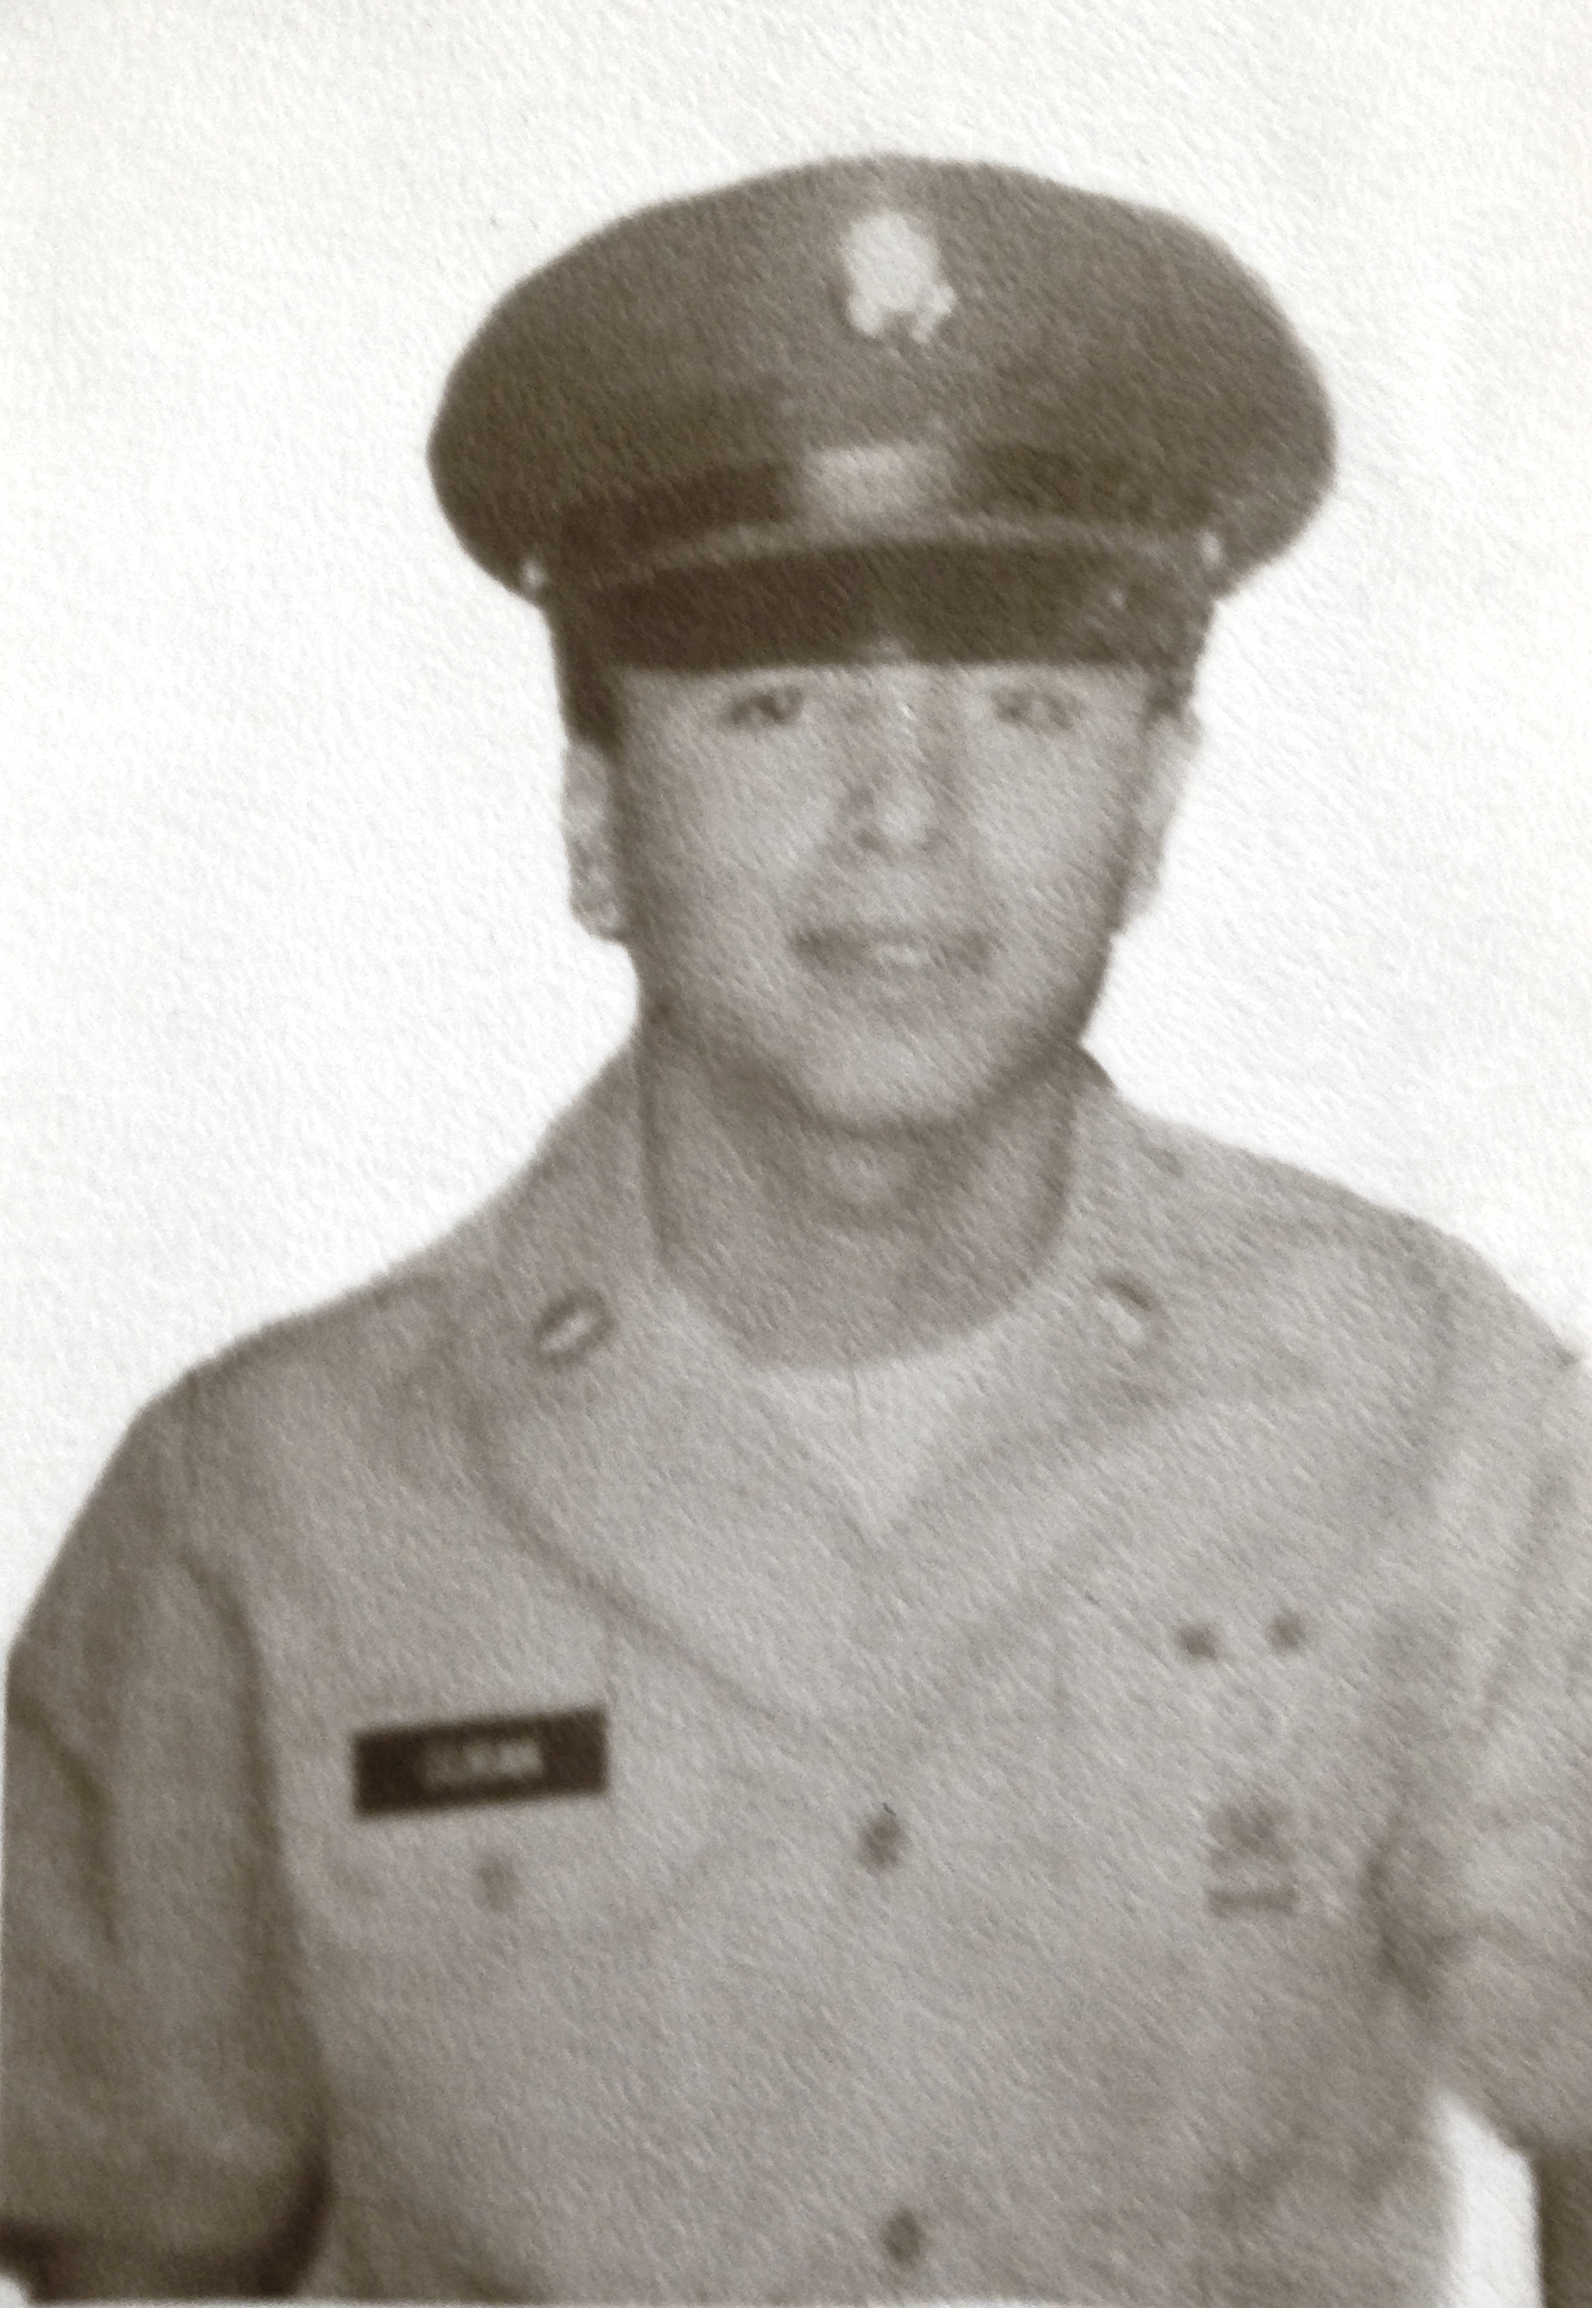 Sergeant Jesus S. Duran